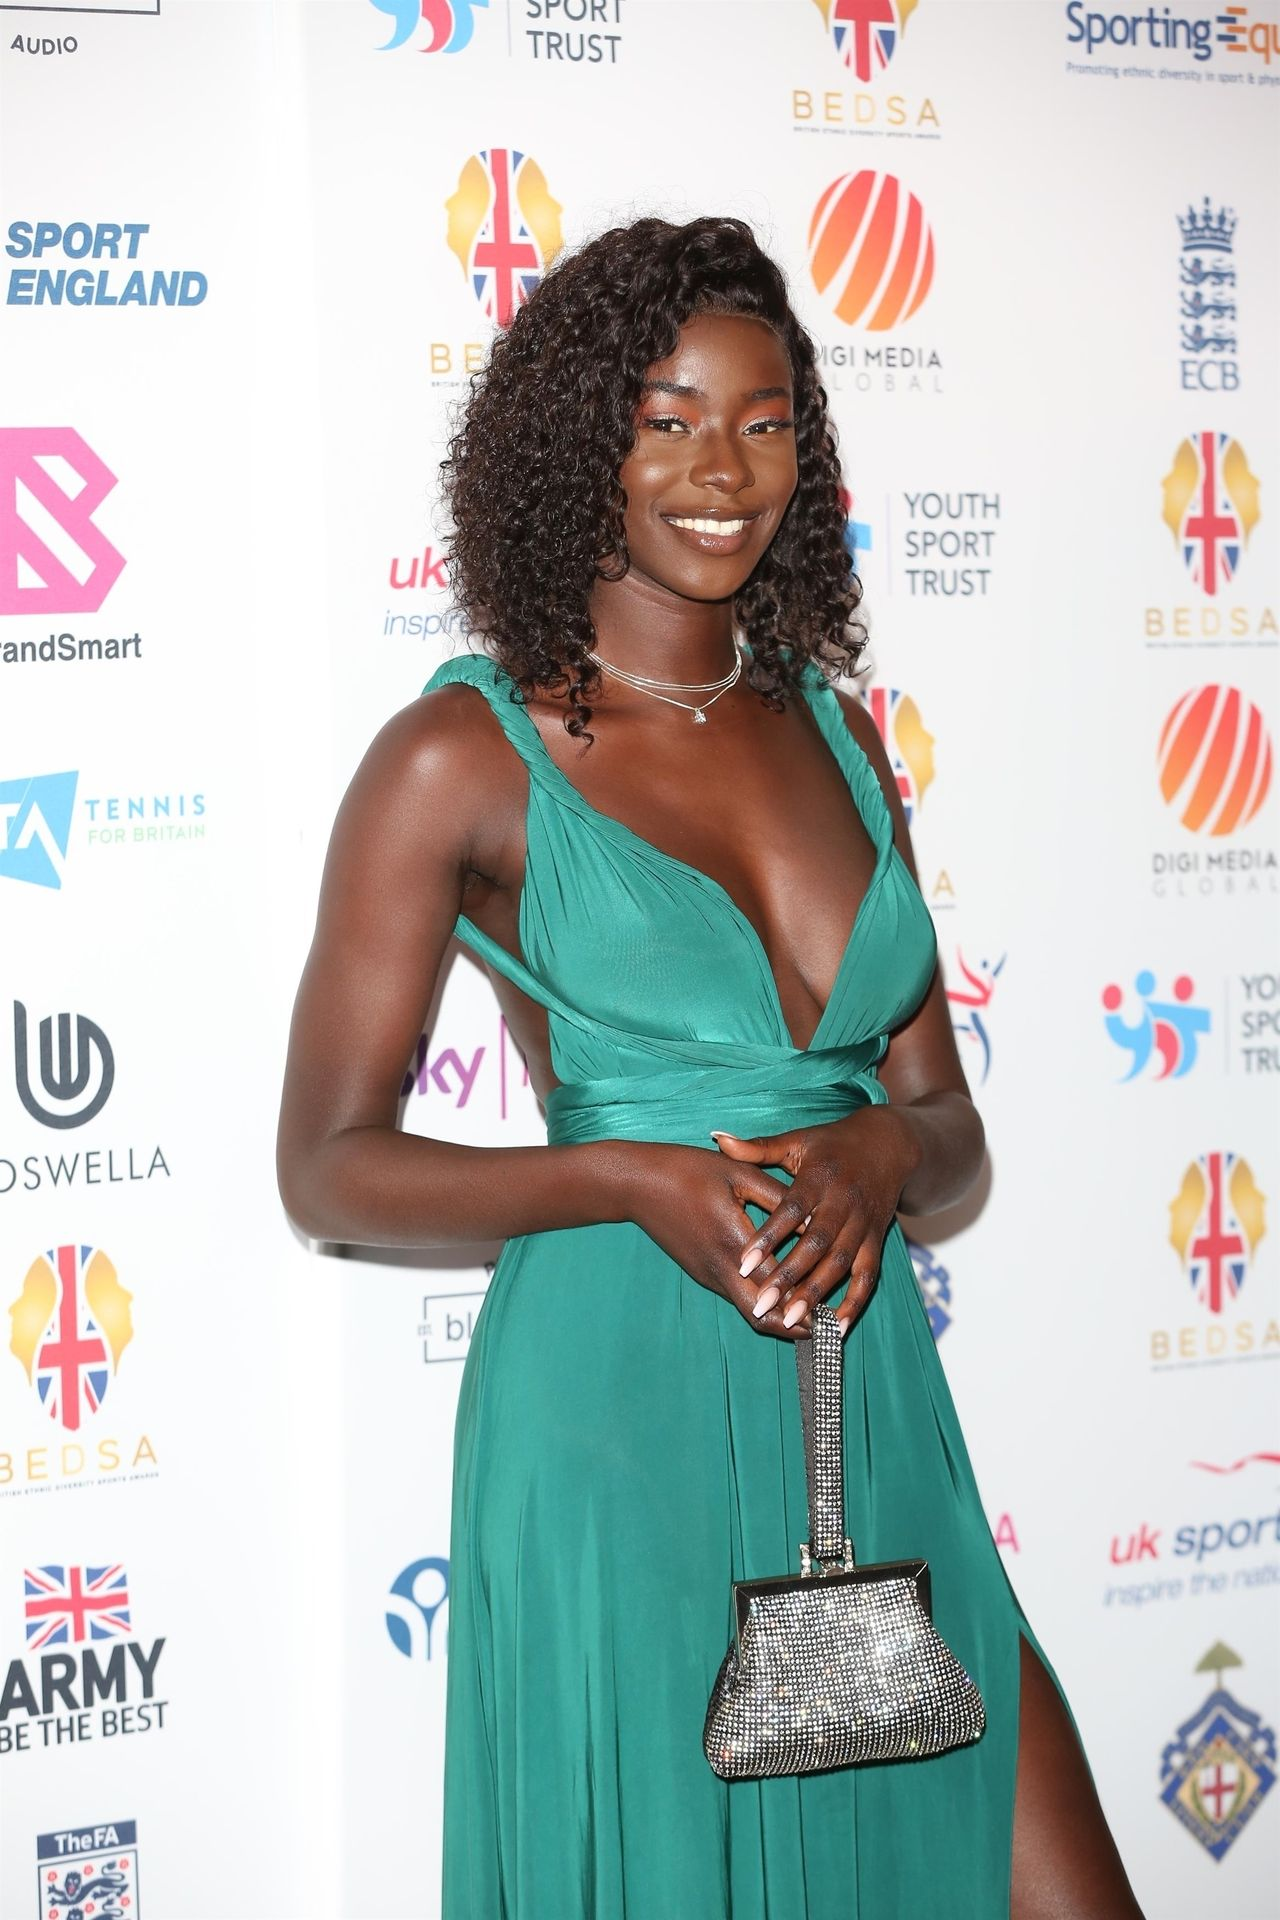 Mike Boateng & Priscilla Anyabu Are Seen At British Ethnic Diversity Sports Awards 0029